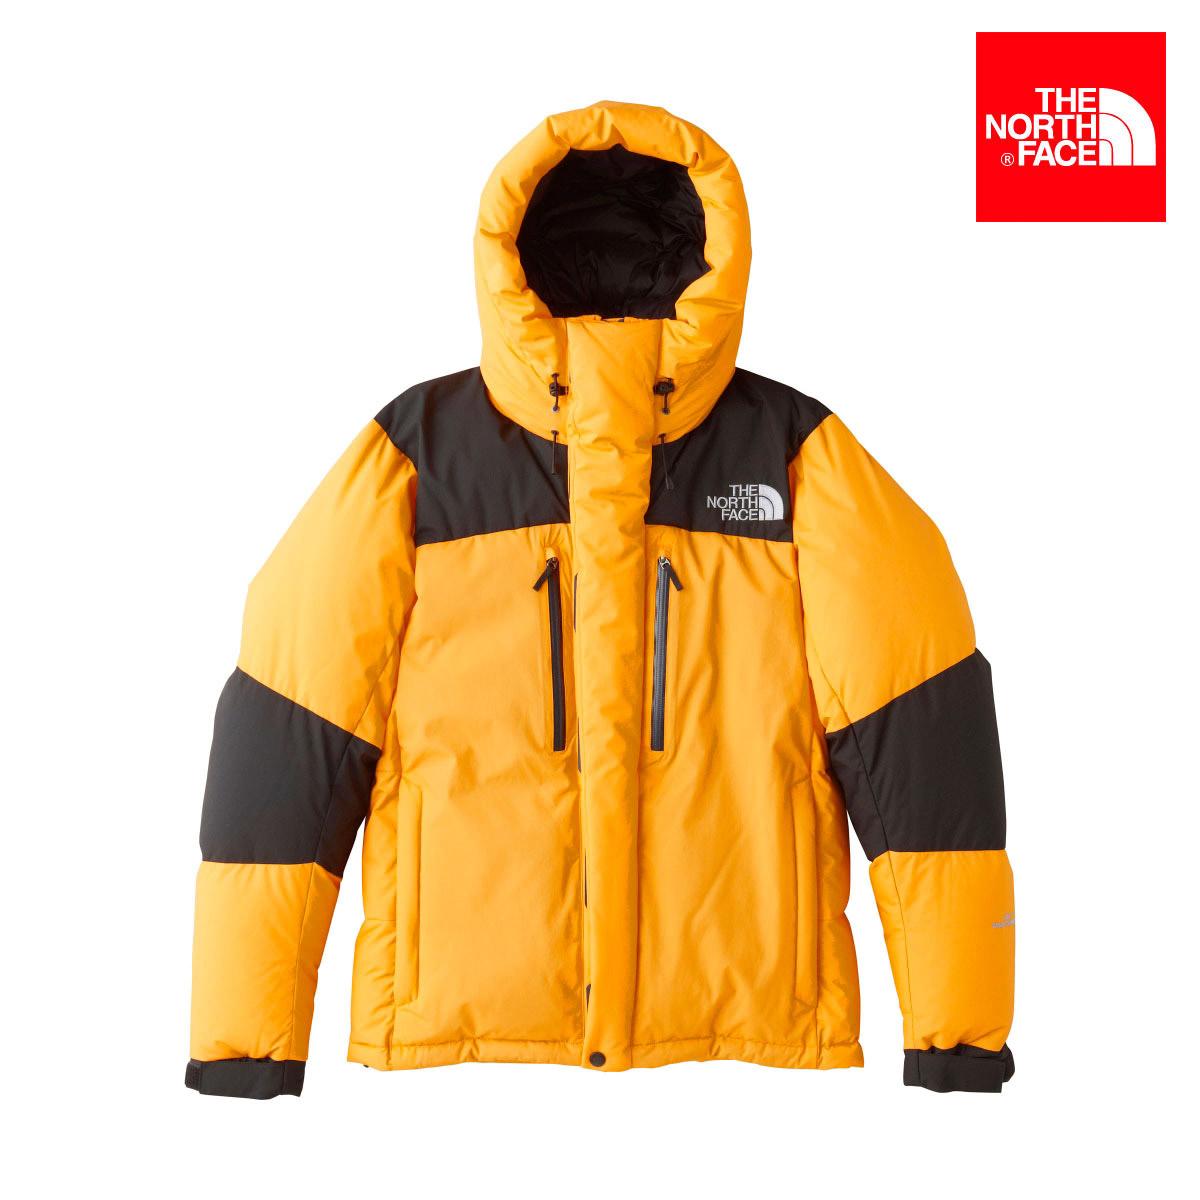 a83ecdcda THE NORTH FACE BALTRO LIGHT JKT (the North Face Bartholo light jacket)  zinnia O 17FW-I